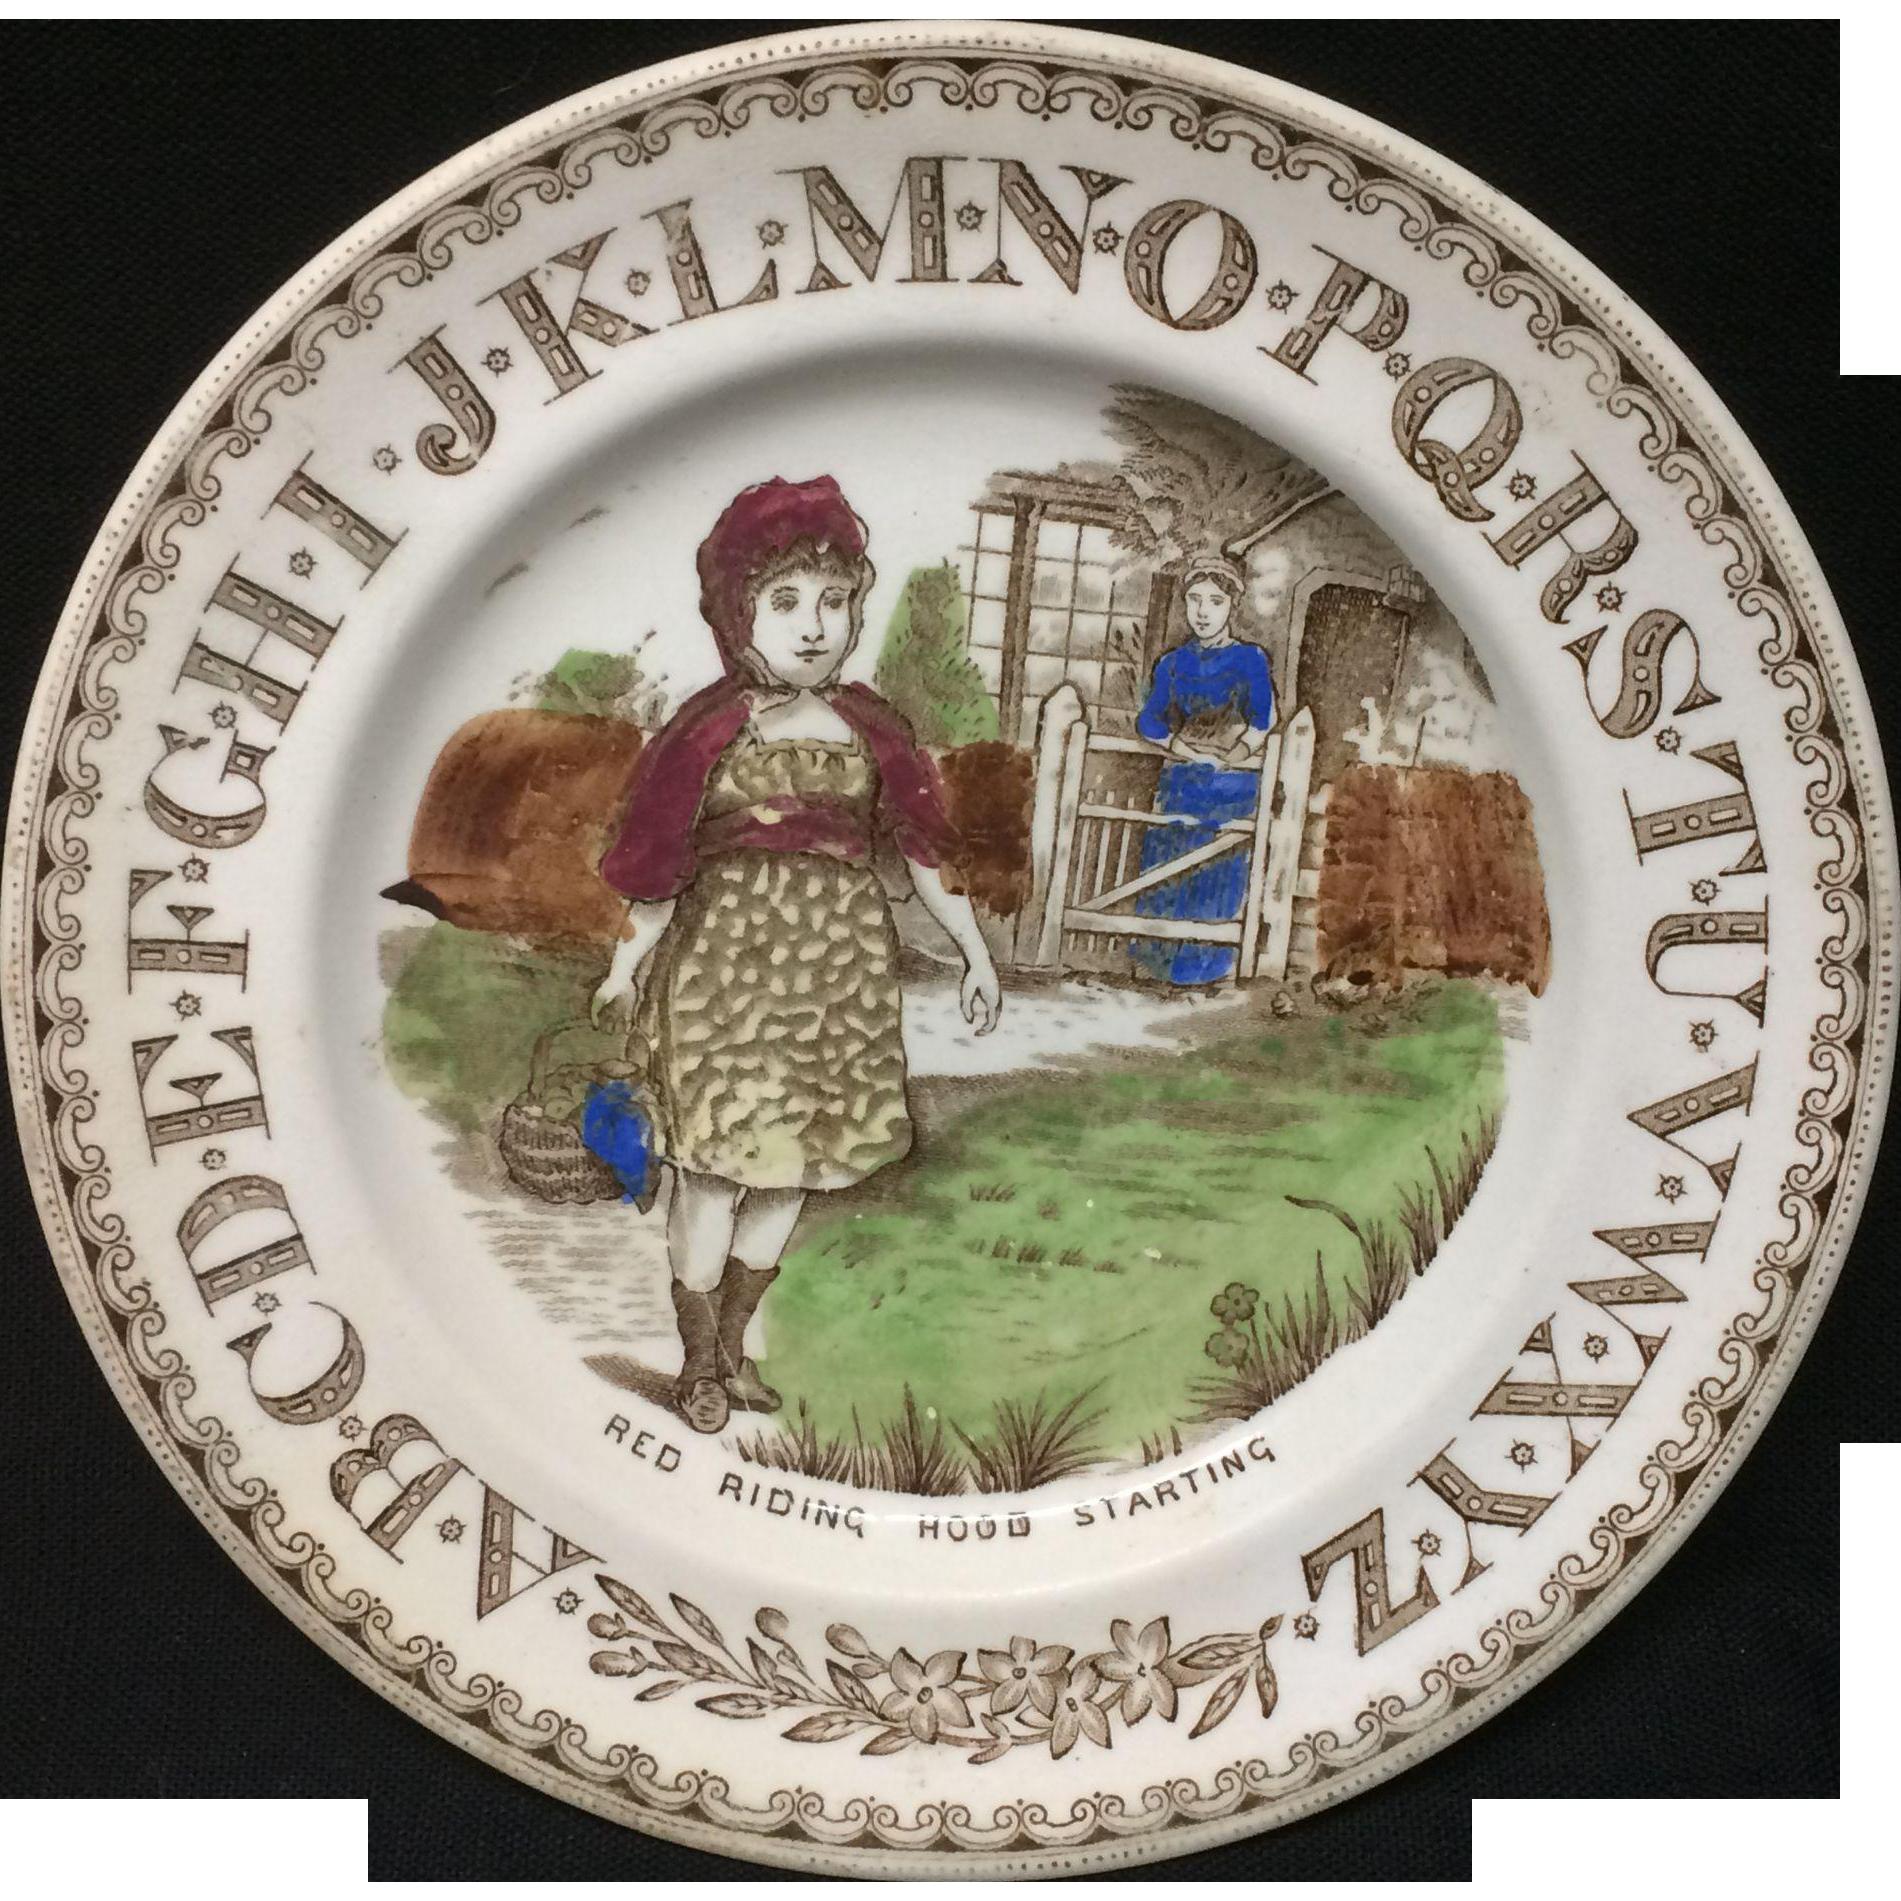 1880 ~ Staffordshire 19th Century Nursery Plates ~ Red Riding Hood Starting